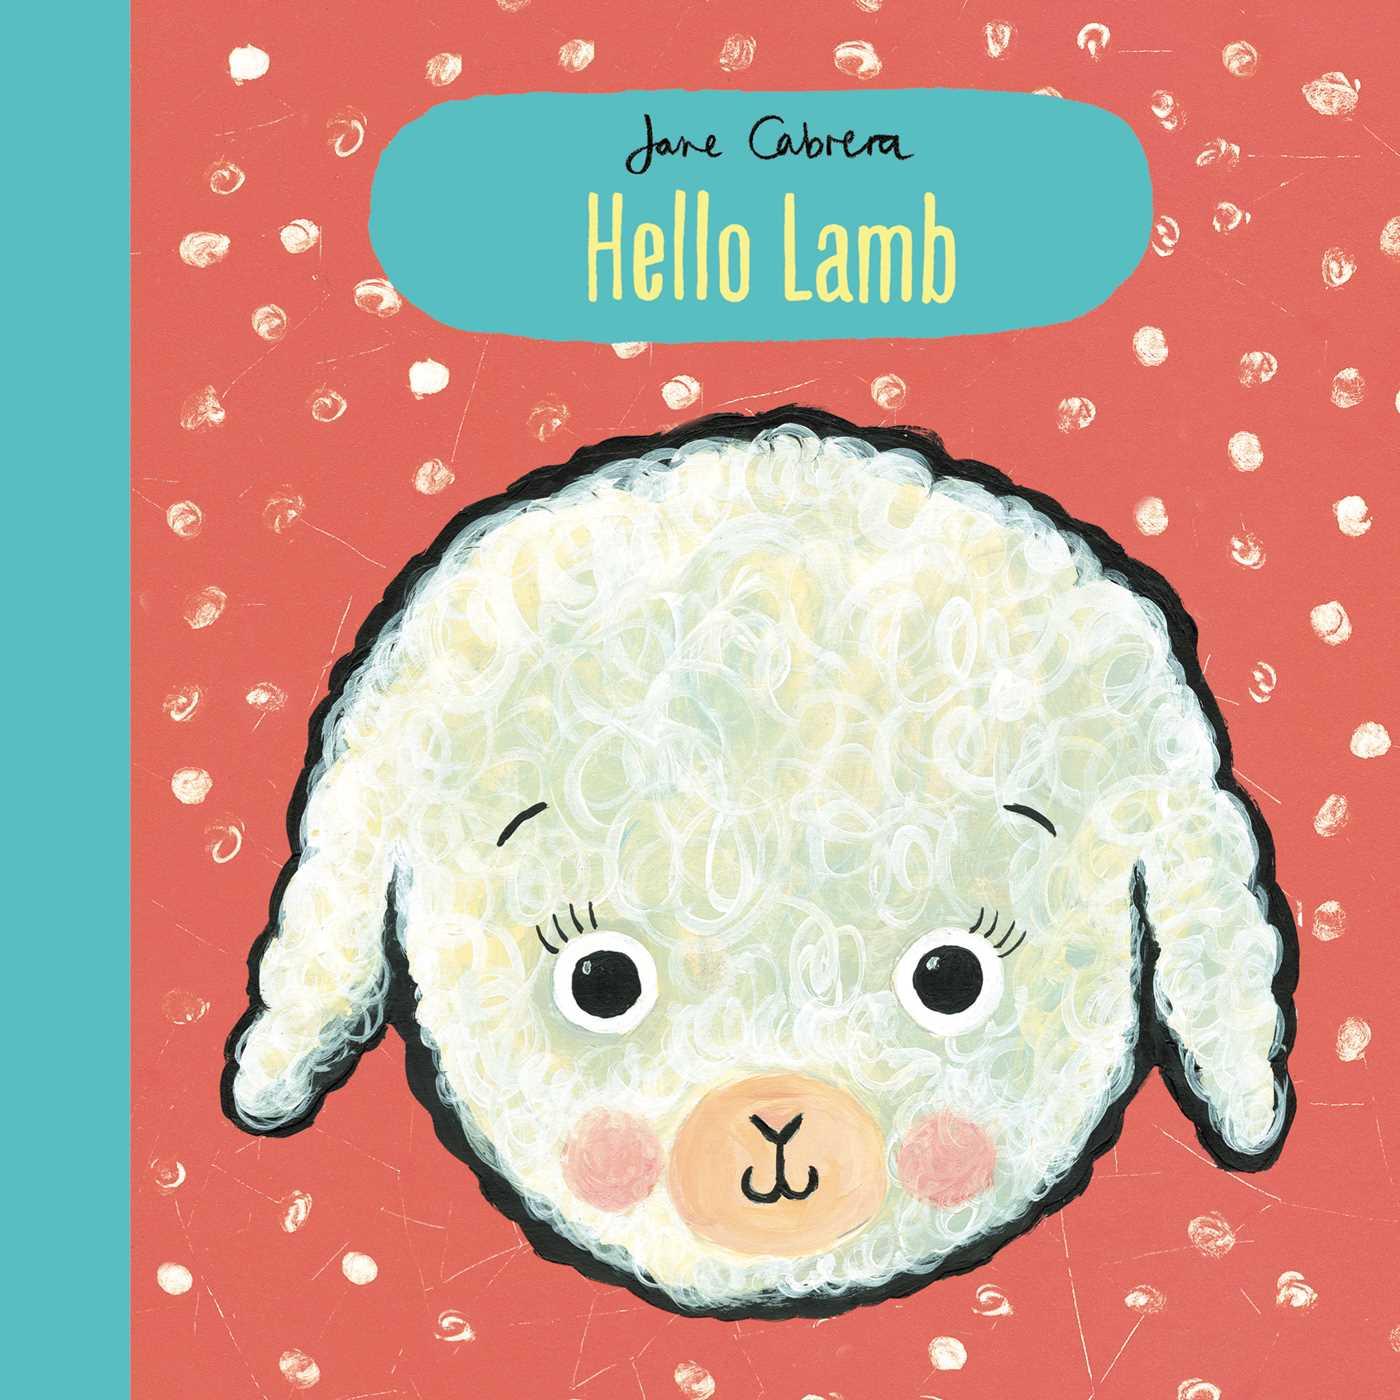 Hello lamb 9781499804300 hr